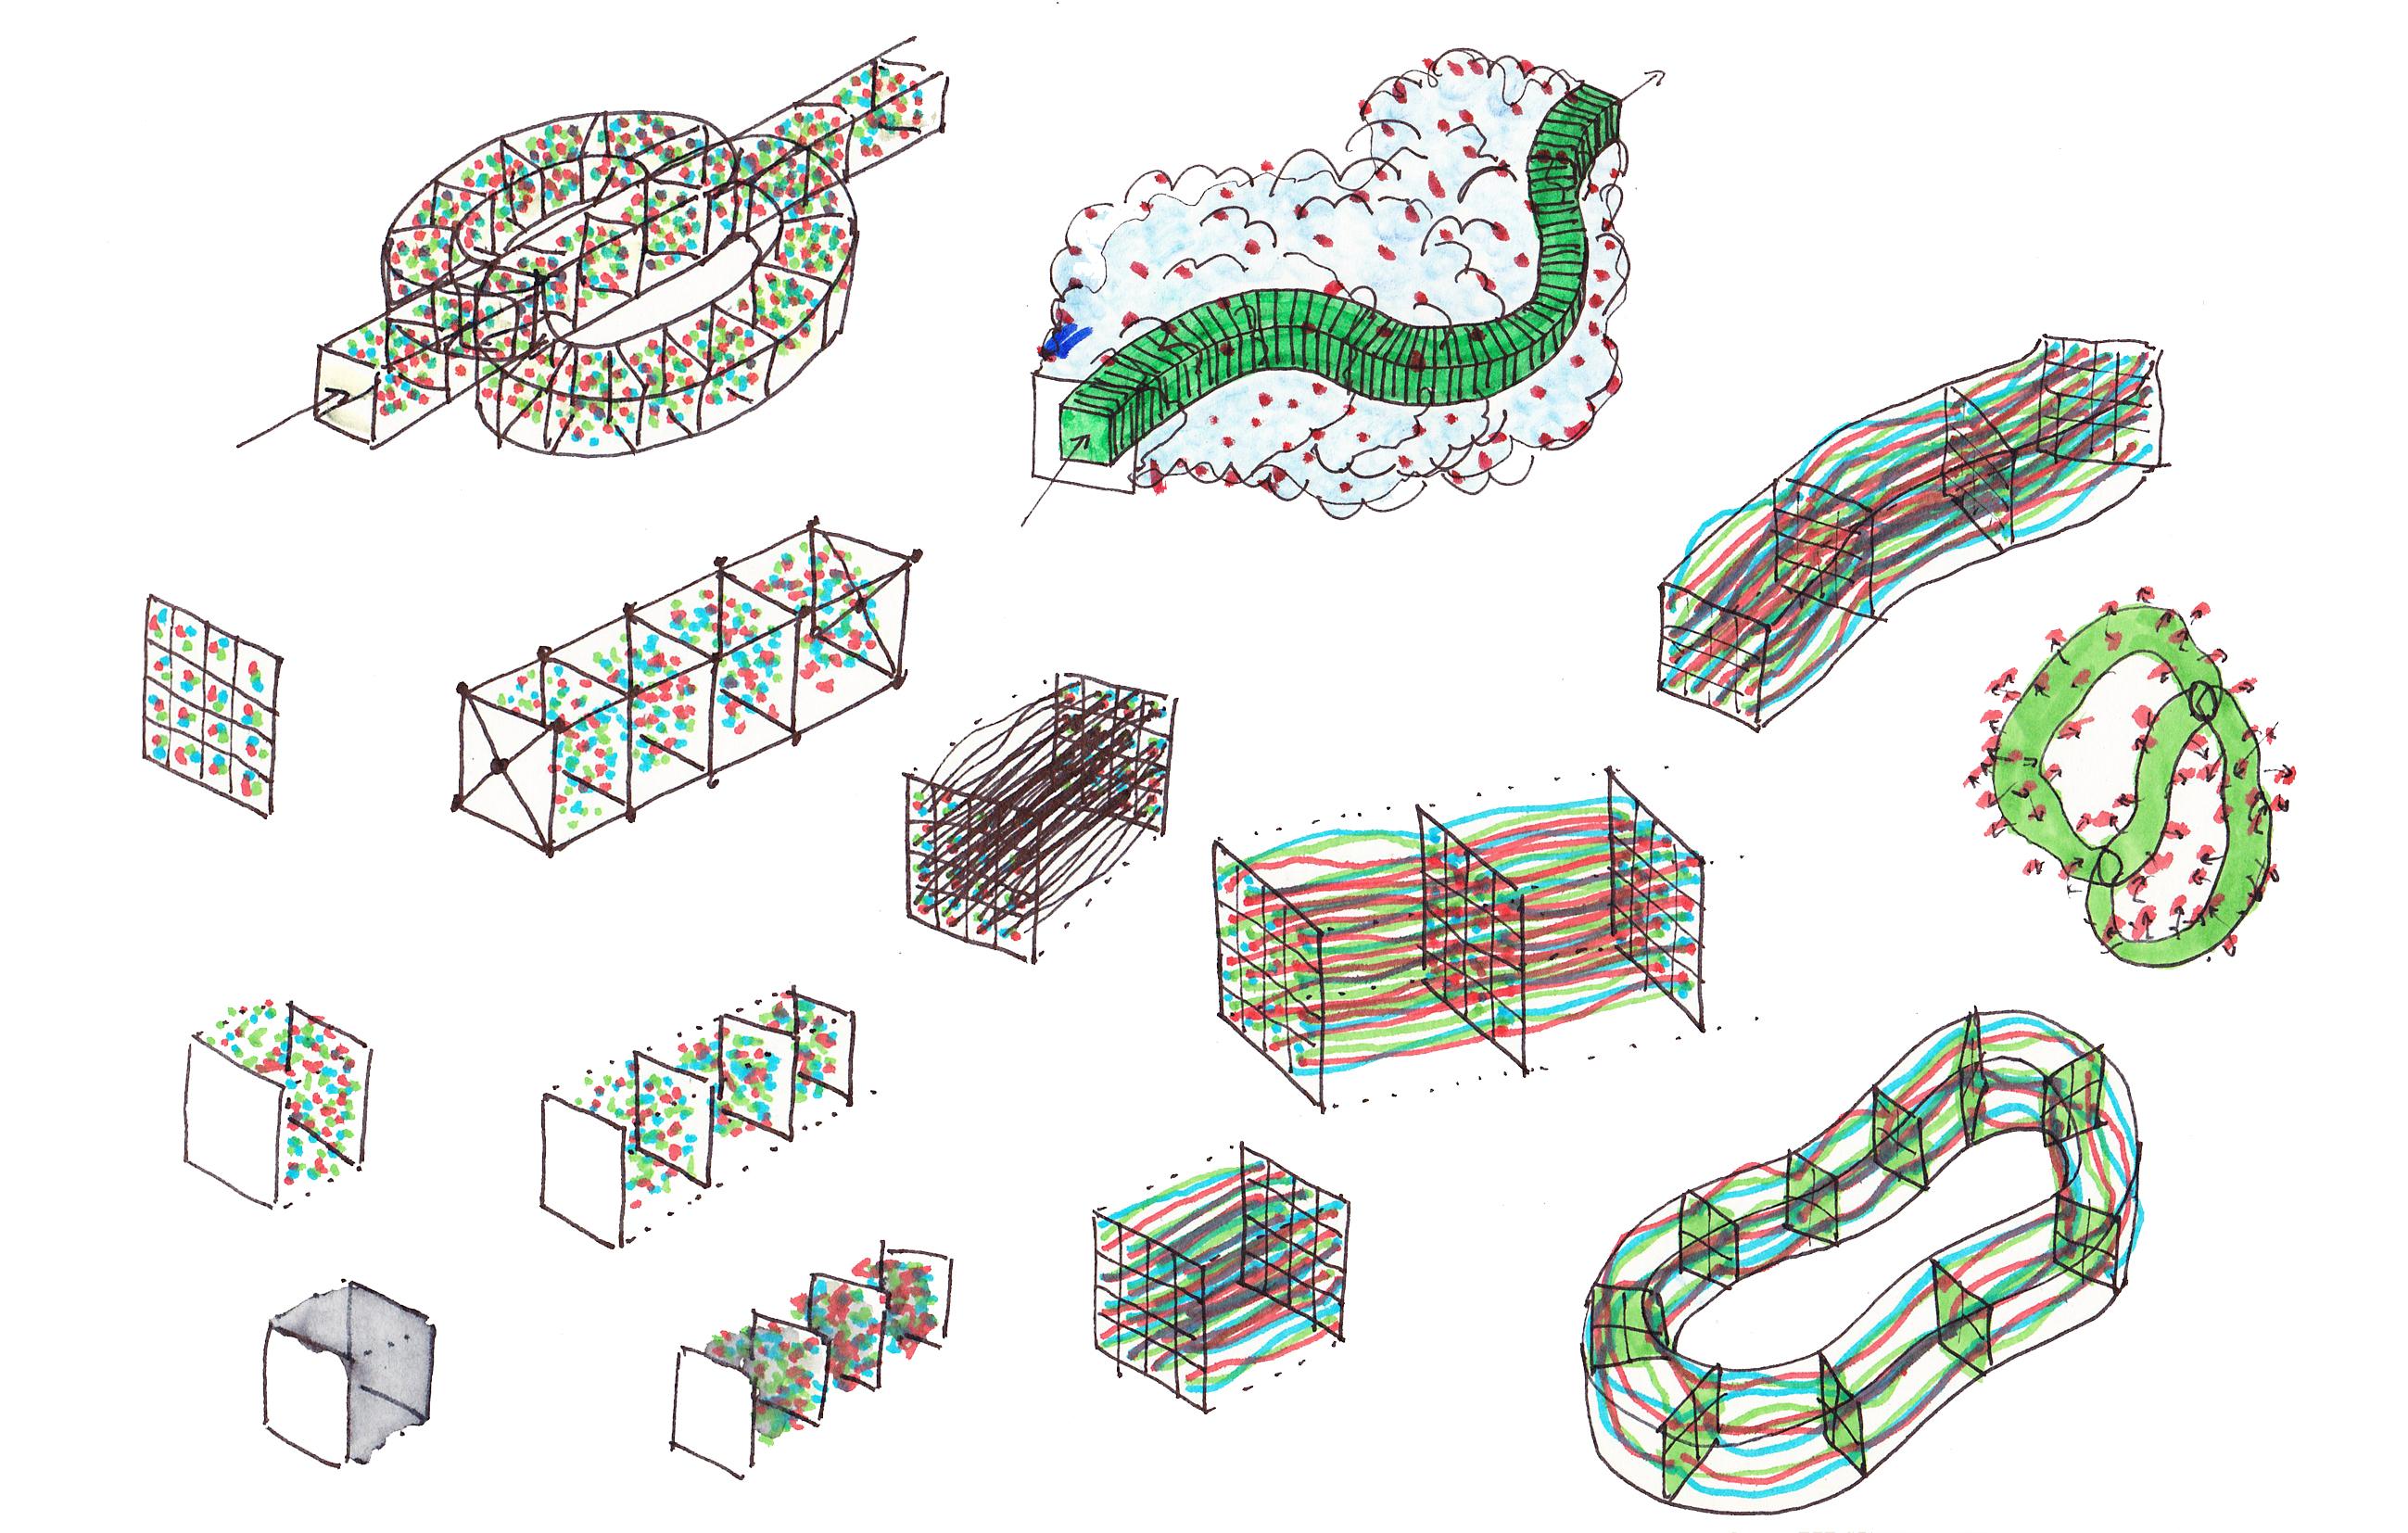 montage-illustration-mg-1